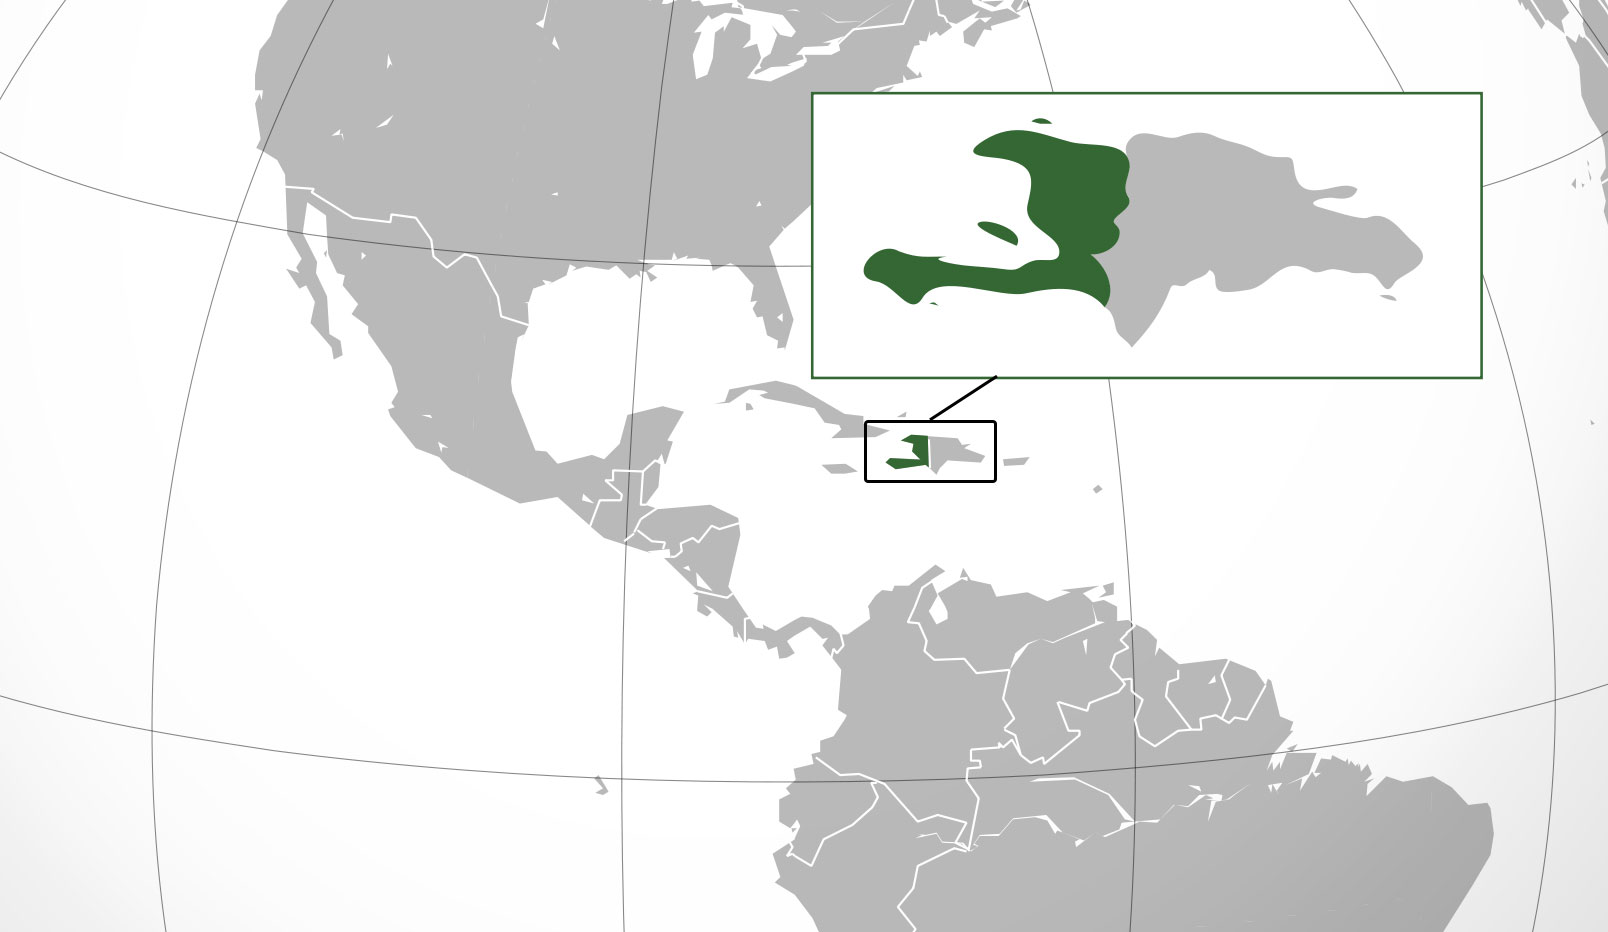 Mapa de Hait donde est queda pas encuentra localizacin